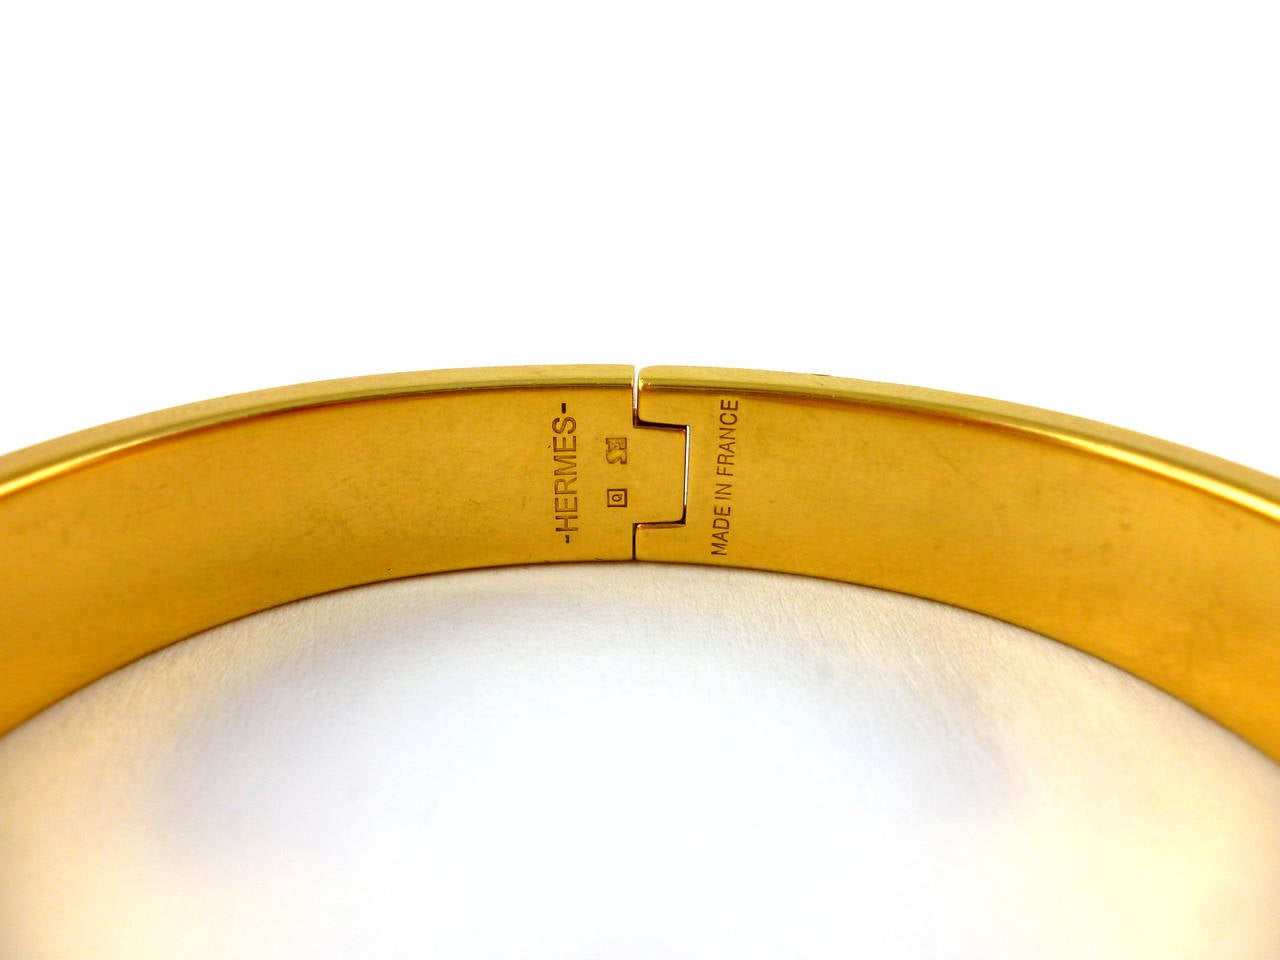 Hermes lagoon blue clic clac h enamel bracelet narrow at 1stdibs - Dimensions clic clac ...